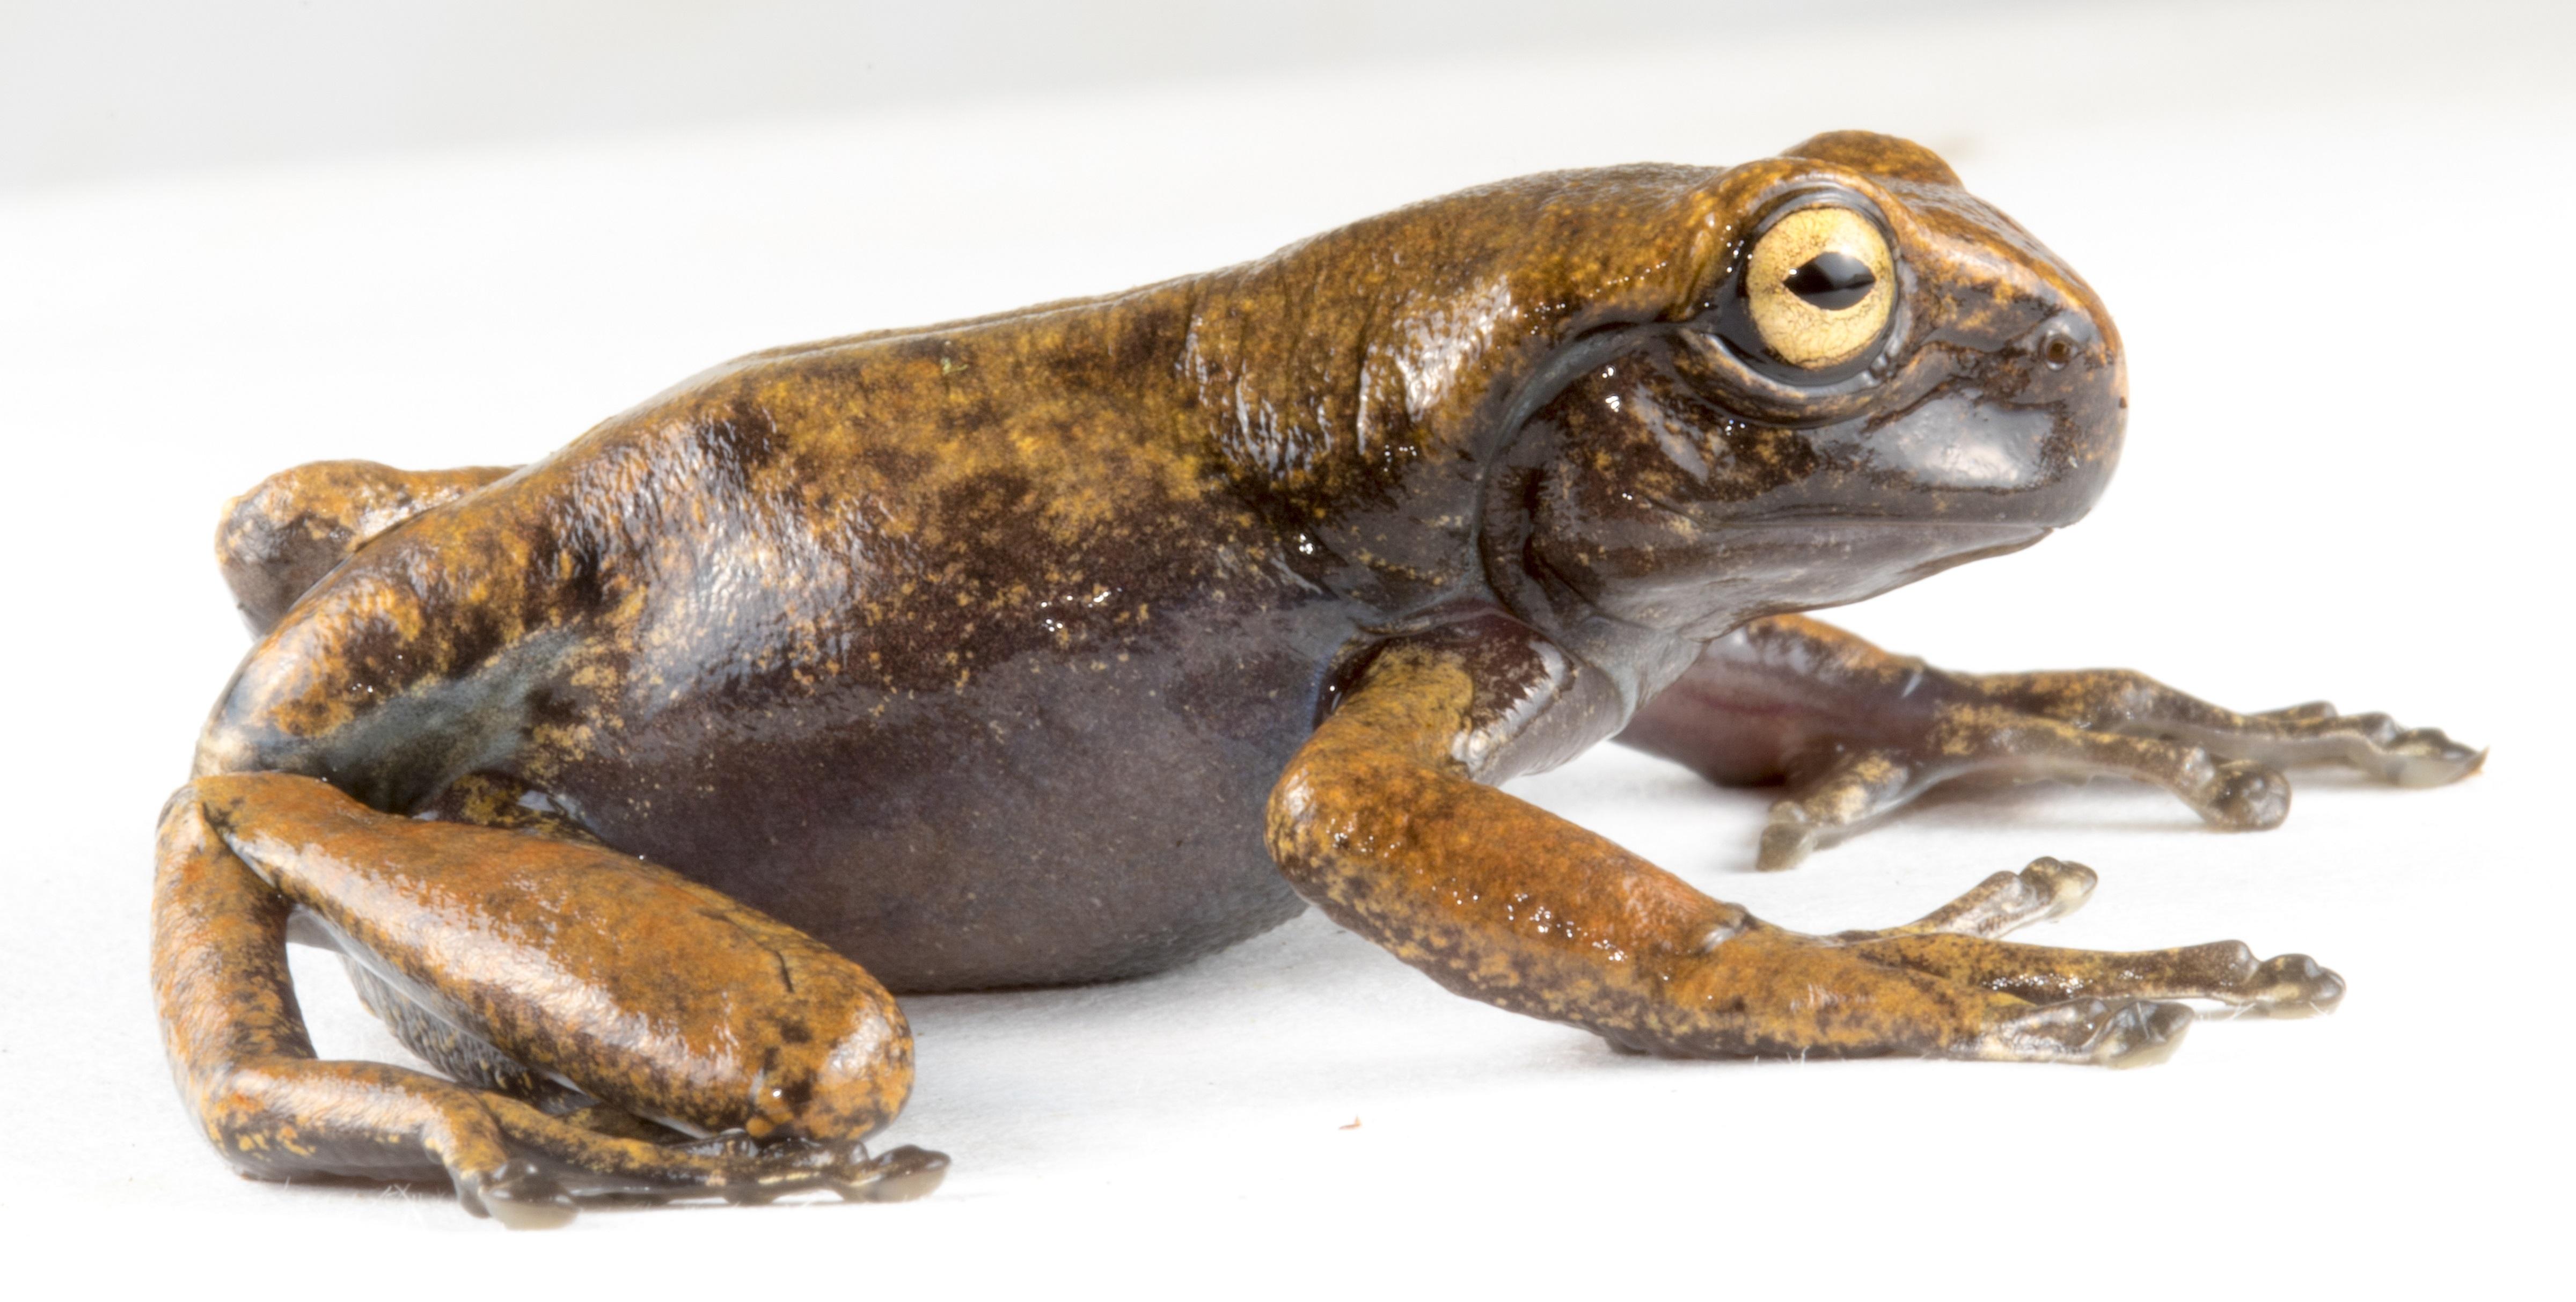 Juvenil de Hyloscirtus hillisi. Foto: PUCE-BIOWEB.